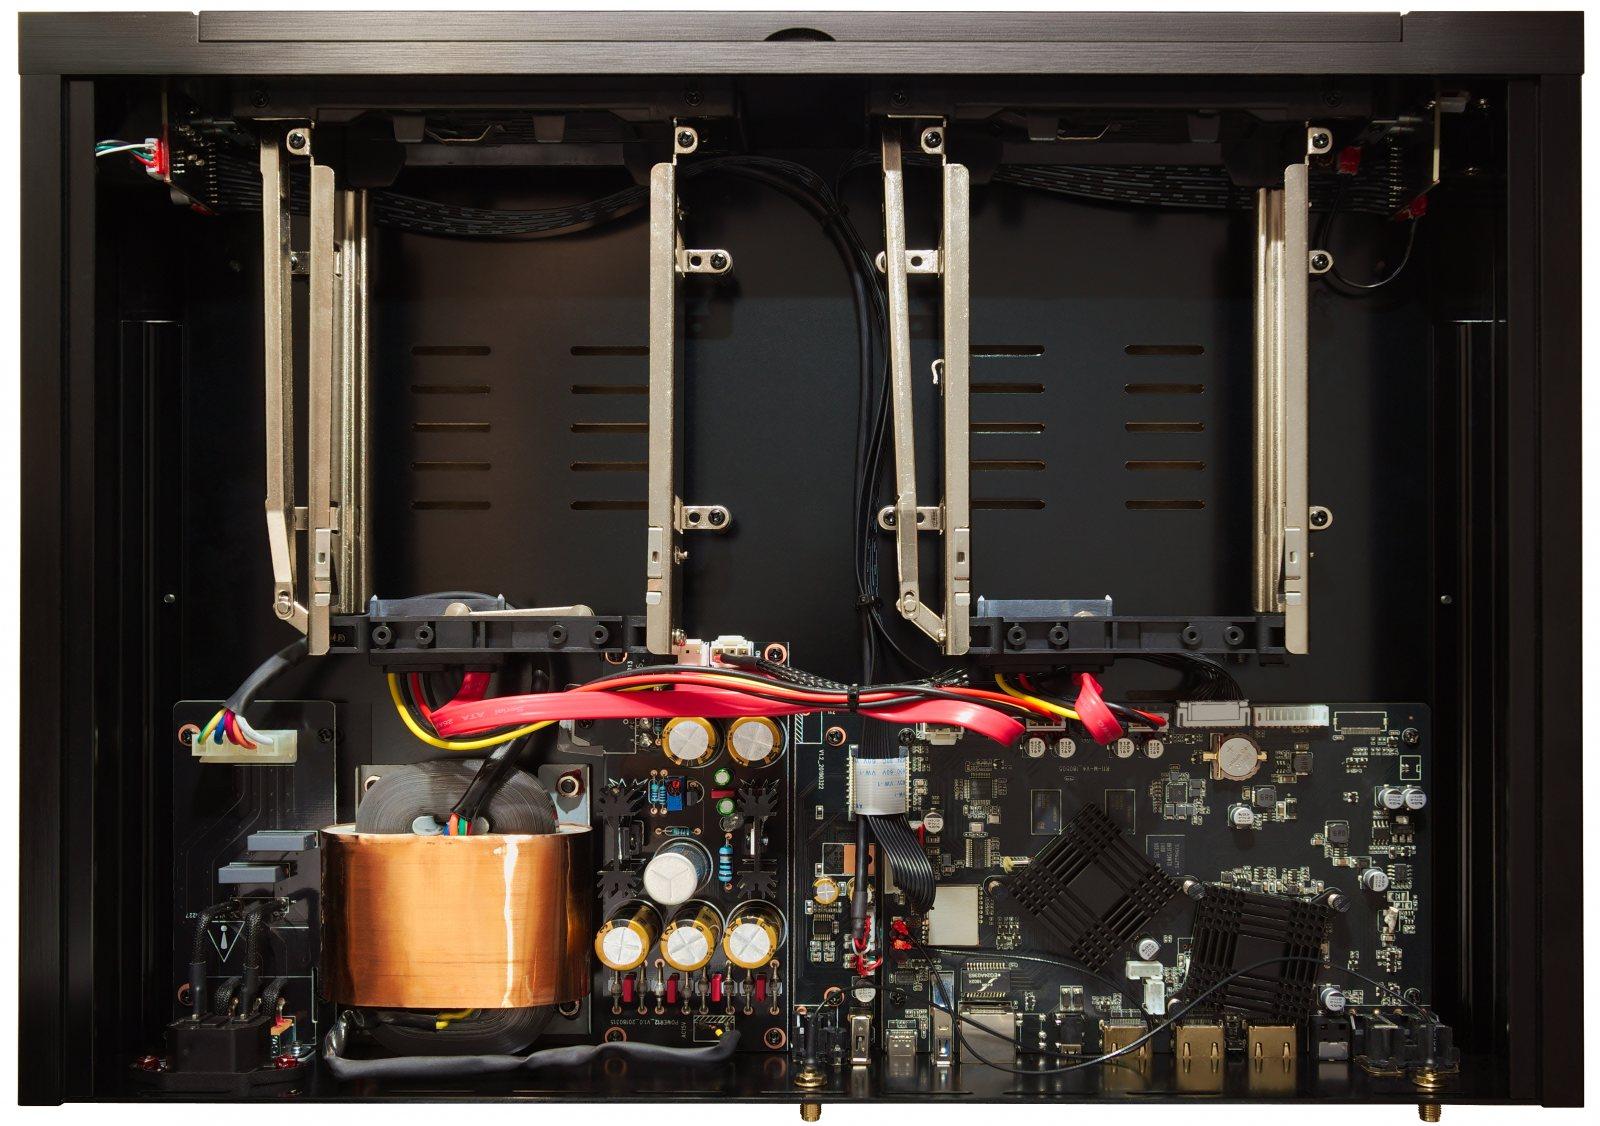 zappiti-pro-4k-hdr-inside-4656x3275.jpg